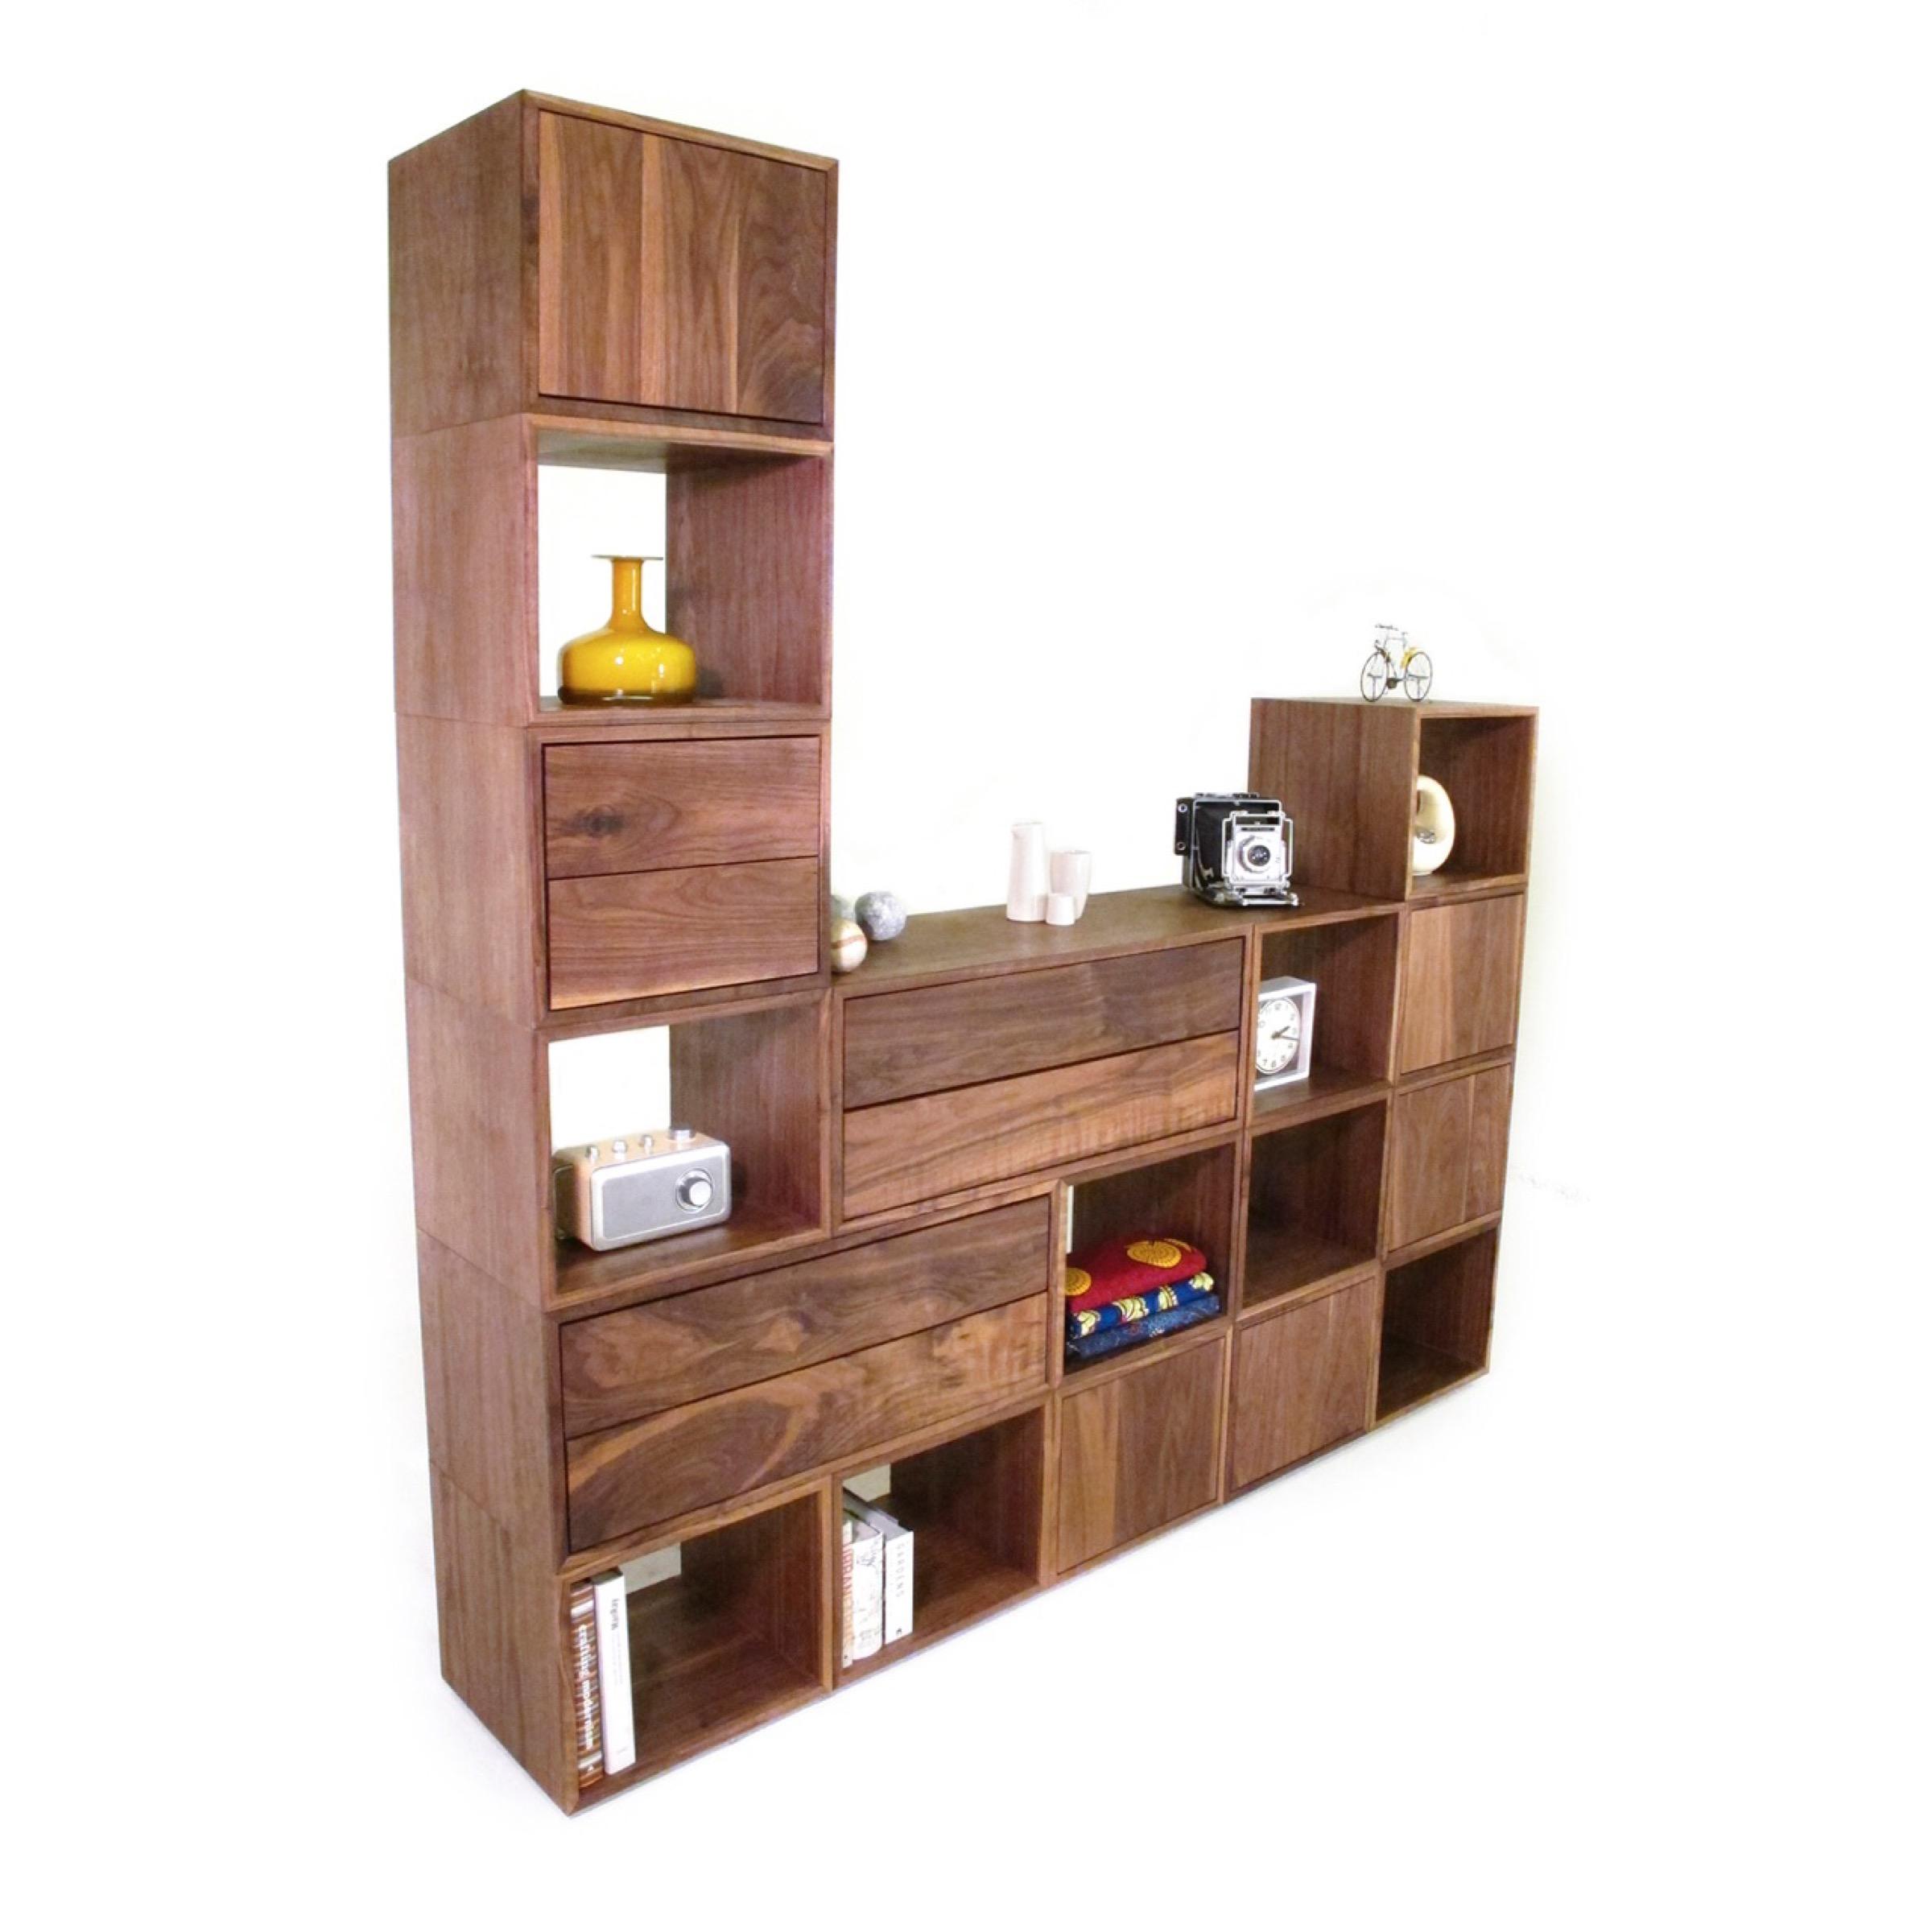 Walnut Cubes     modular system